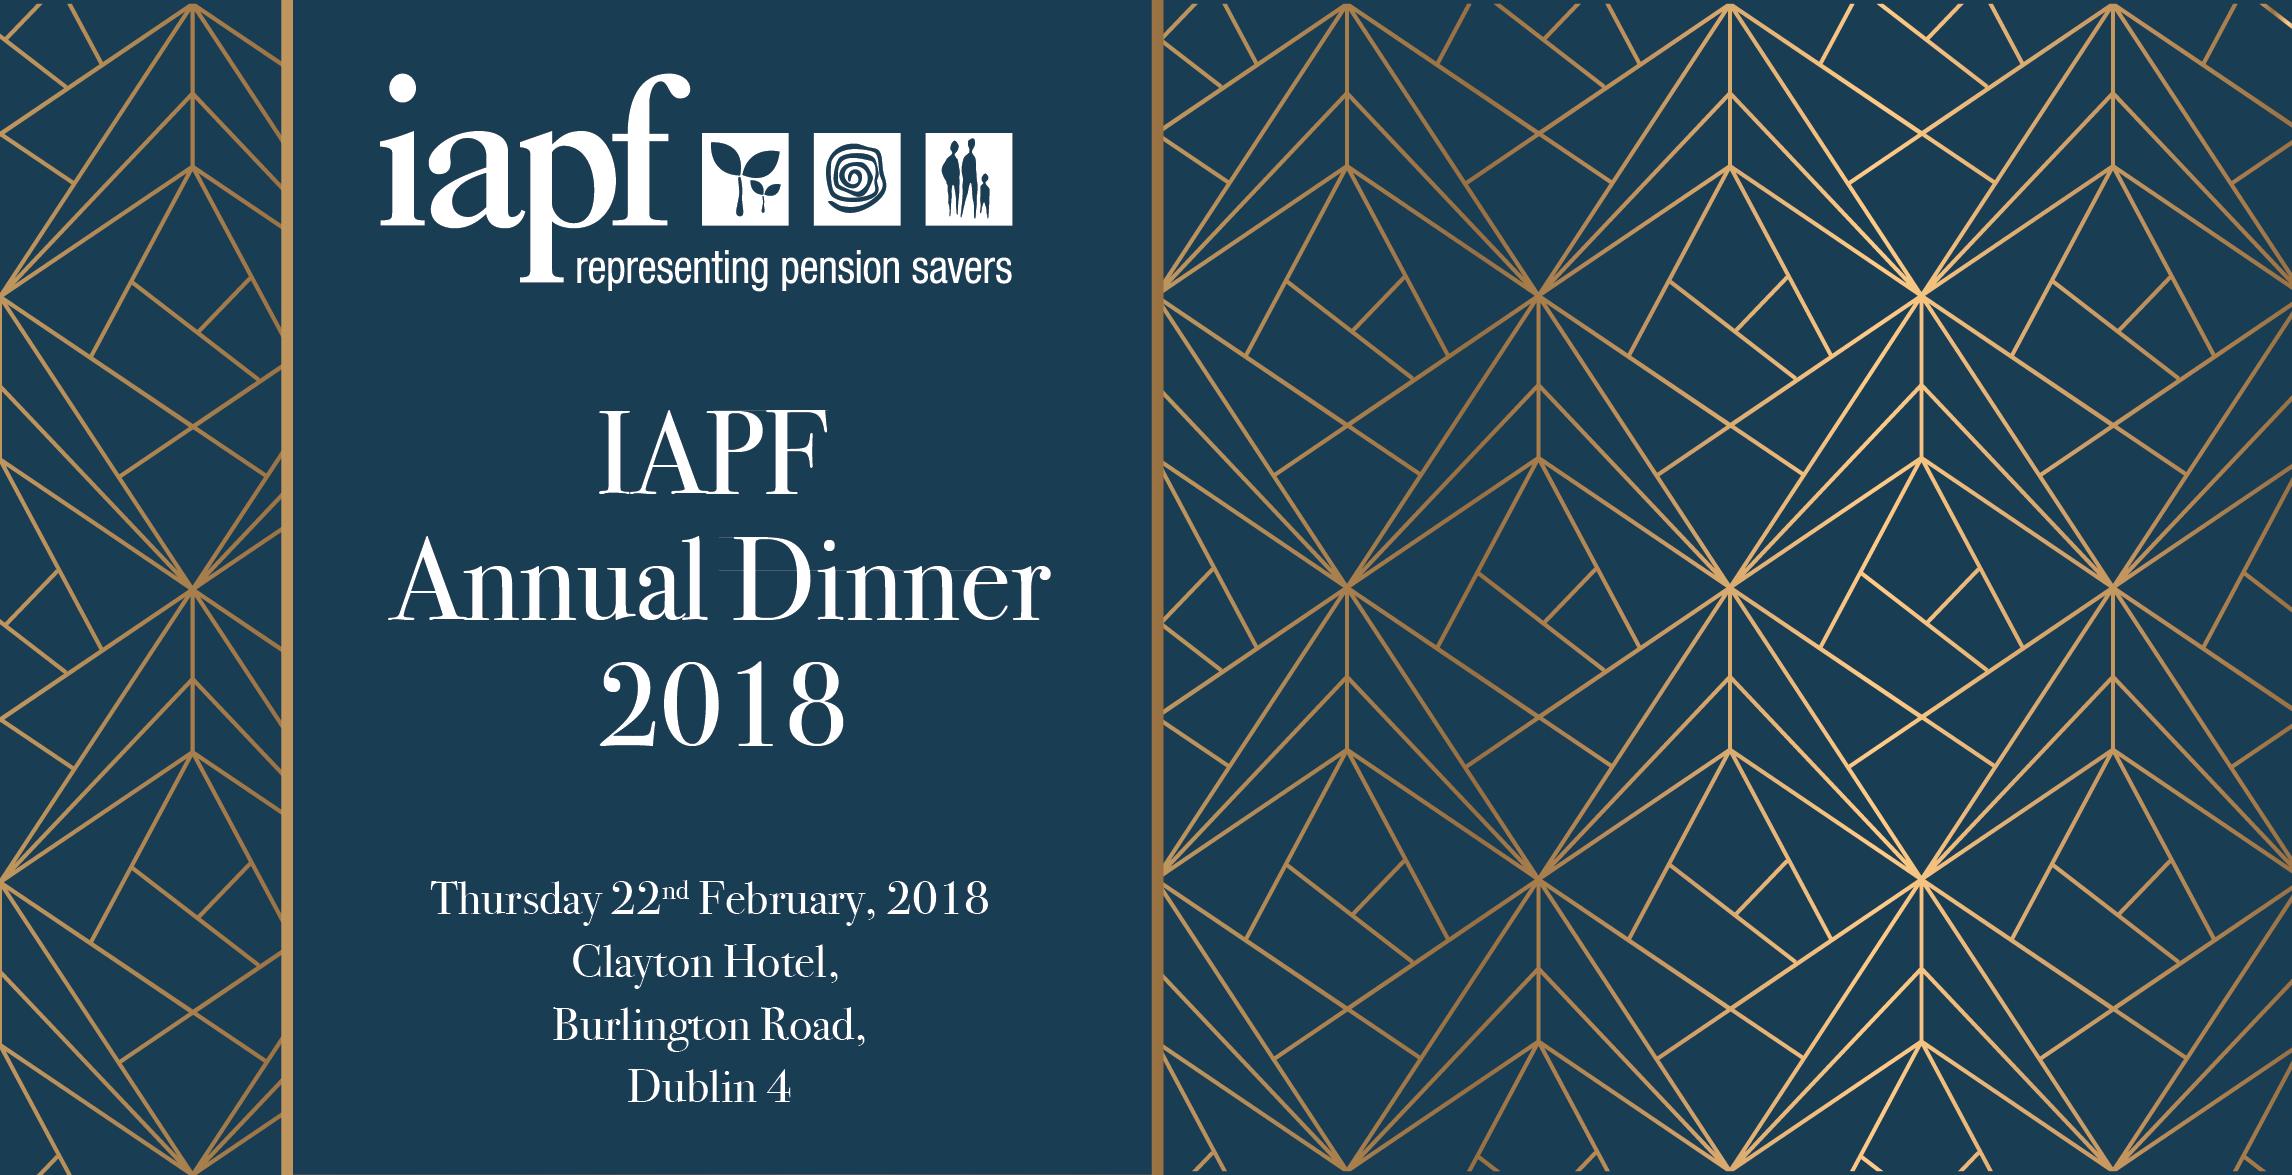 IAPF Annual Dinner